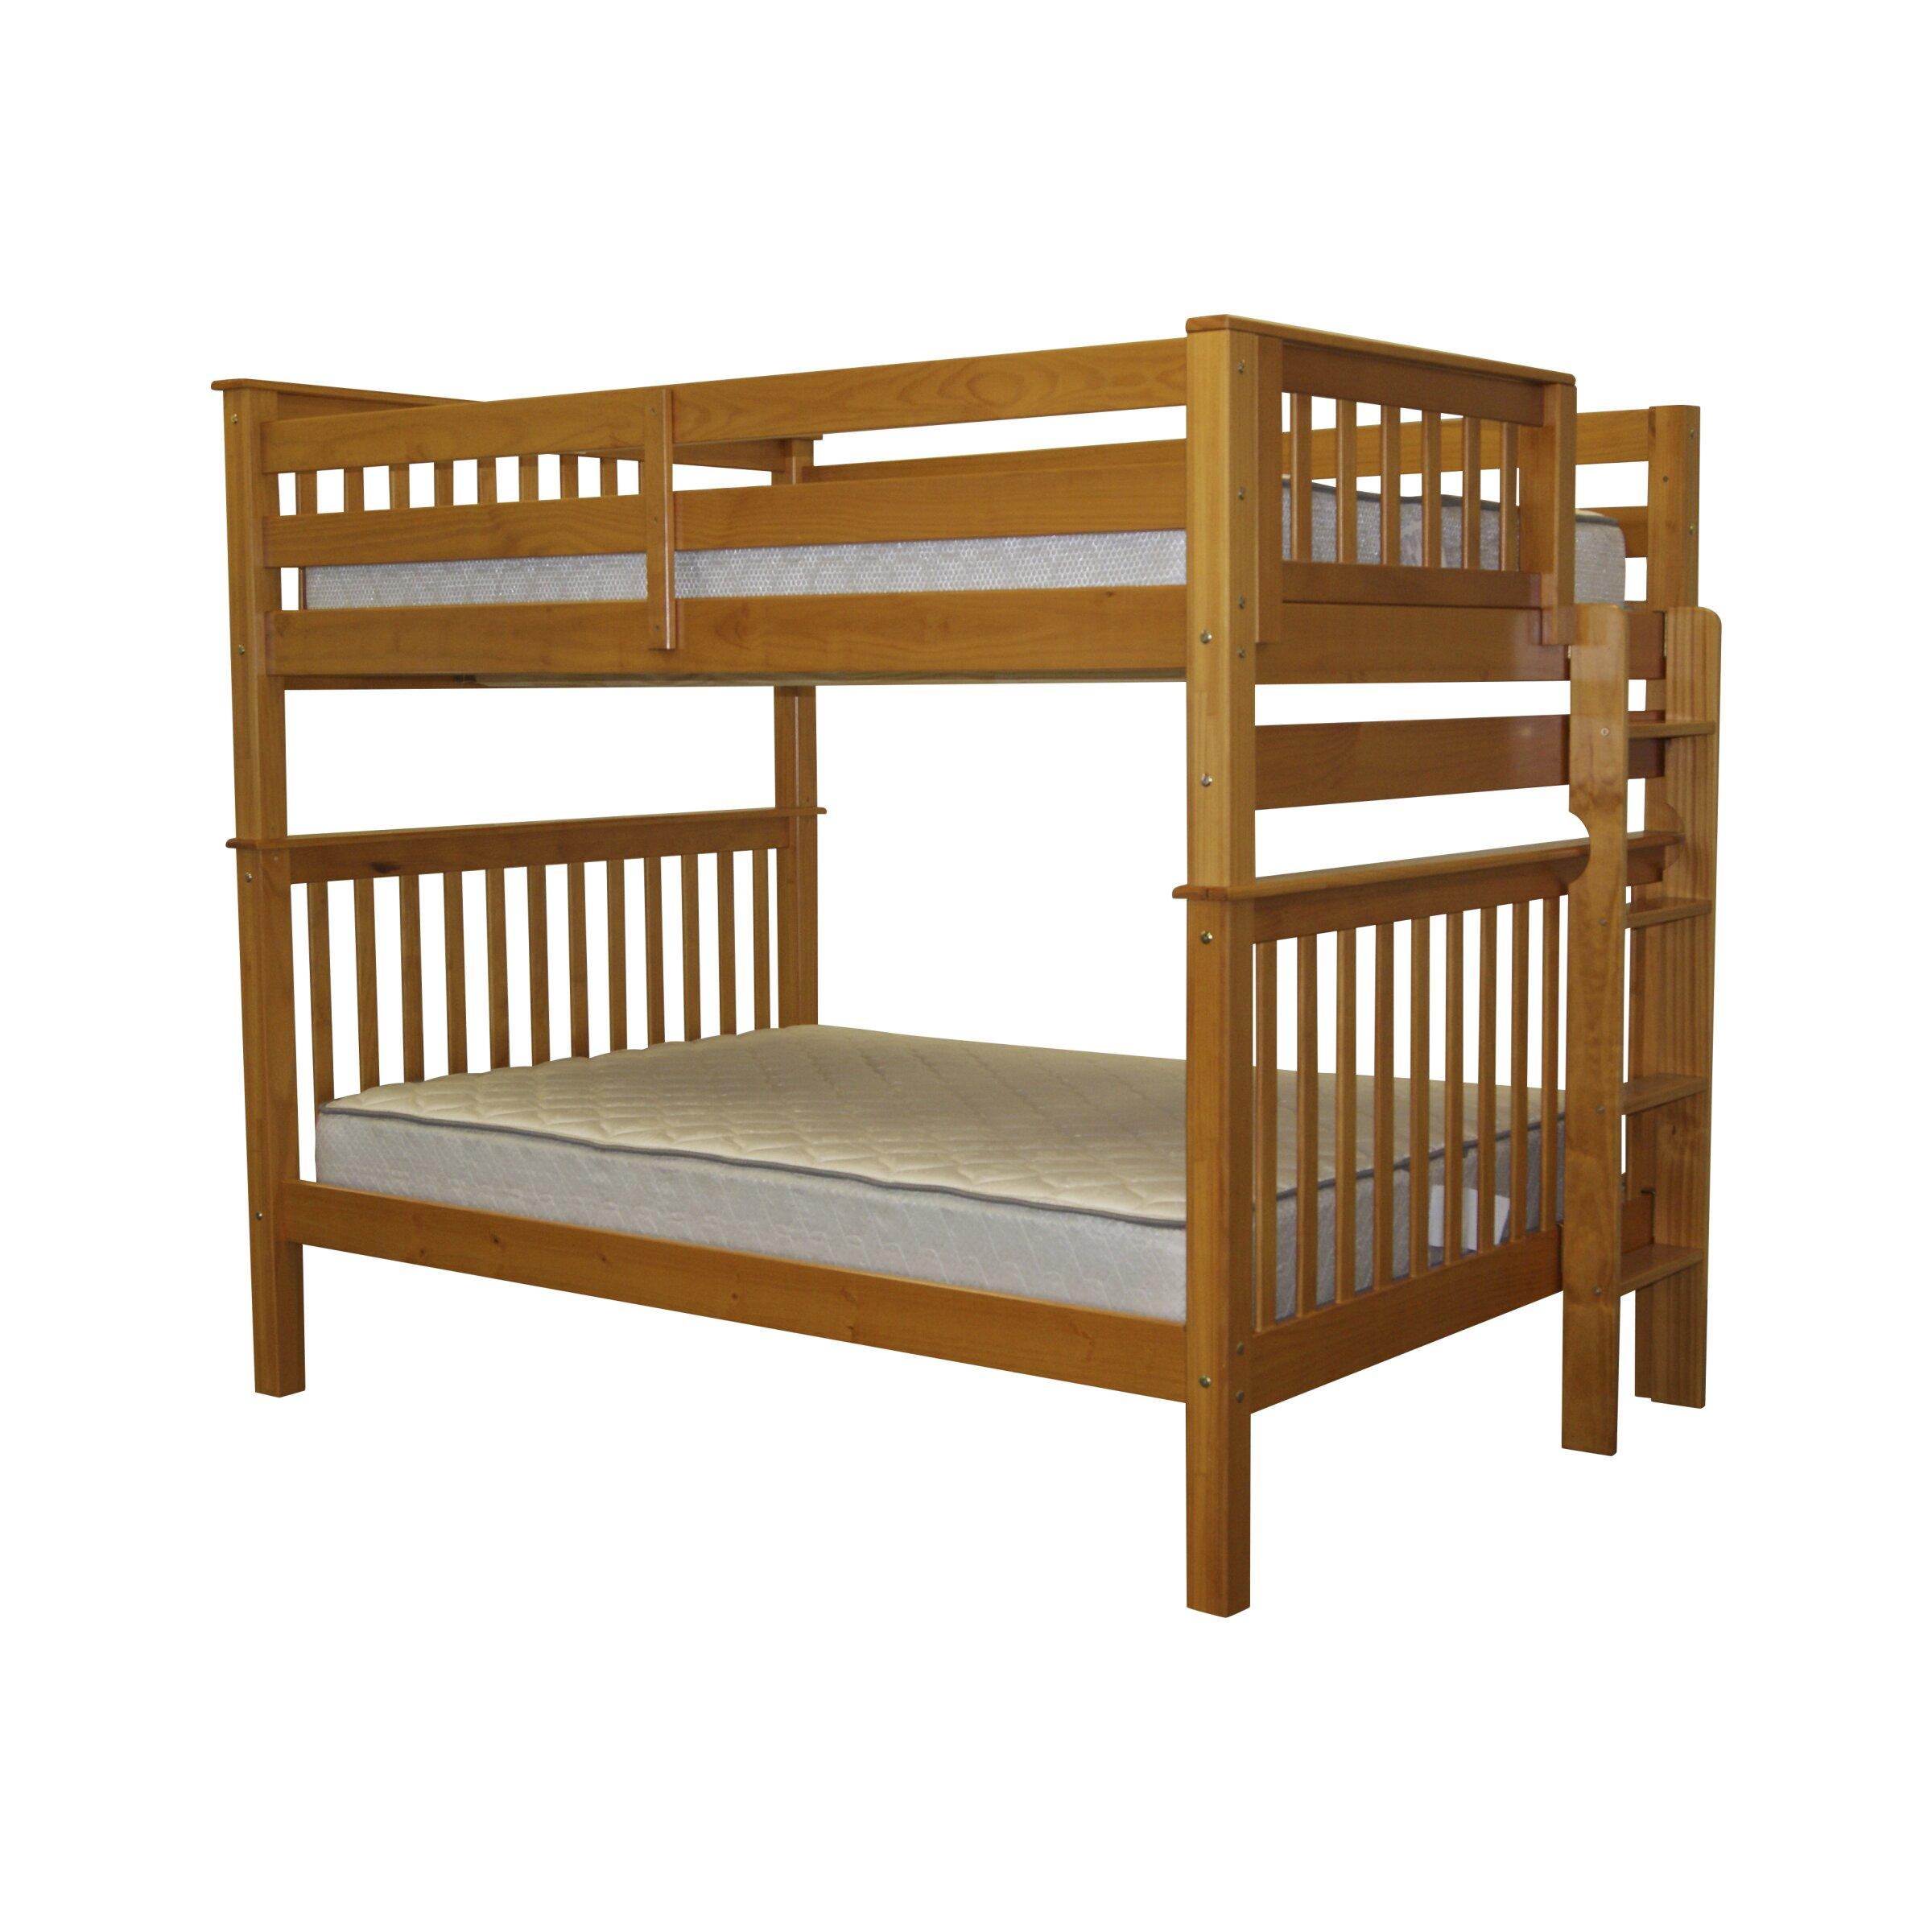 bedz king full over full bunk bed reviews wayfair. Black Bedroom Furniture Sets. Home Design Ideas